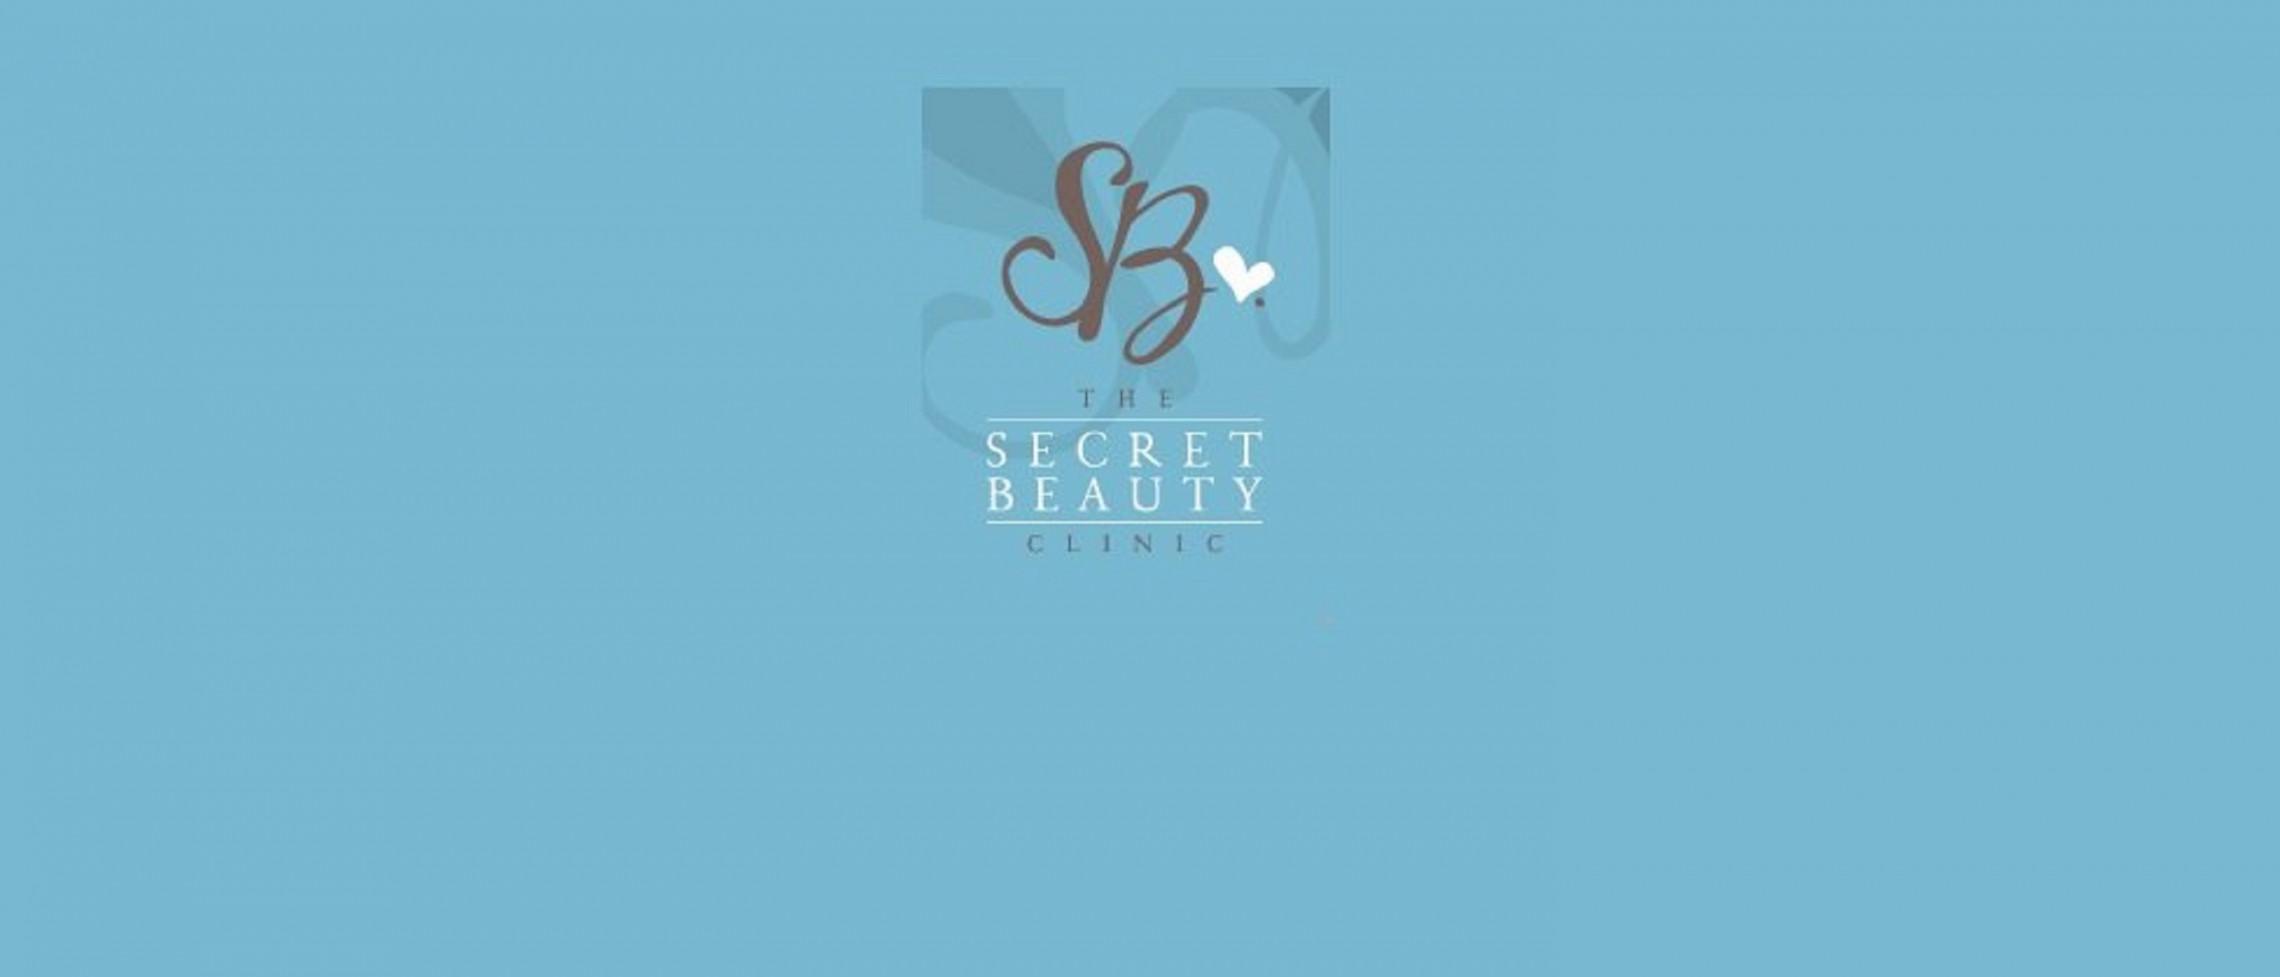 The Secret Beauty Clinic